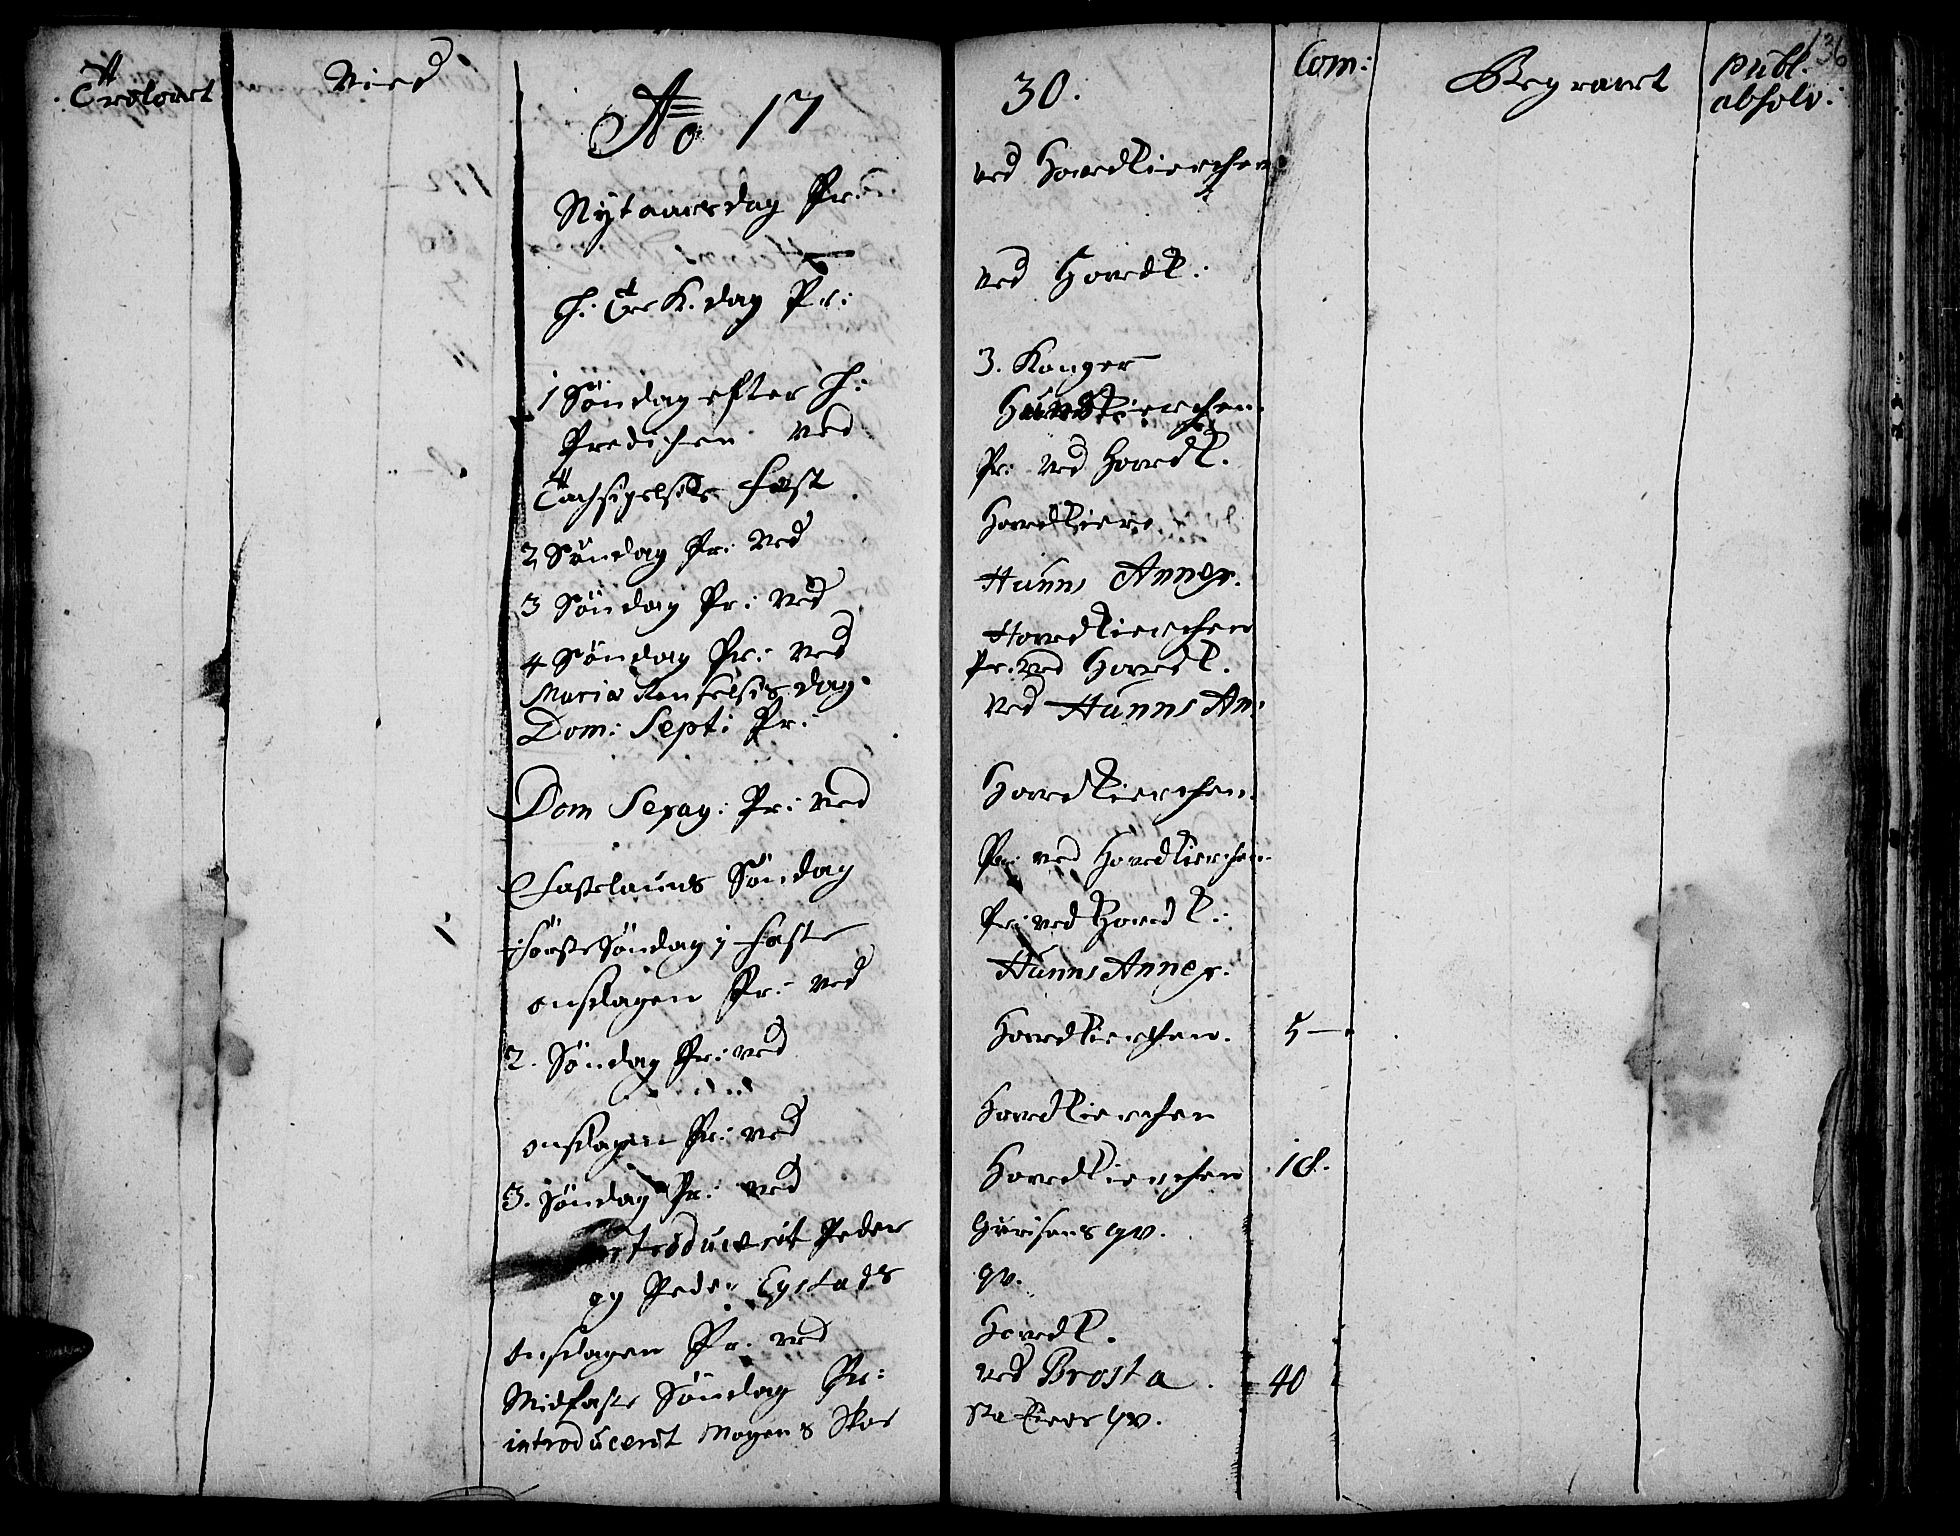 SAH, Vardal prestekontor, H/Ha/Haa/L0001: Ministerialbok nr. 1, 1706-1748, s. 136